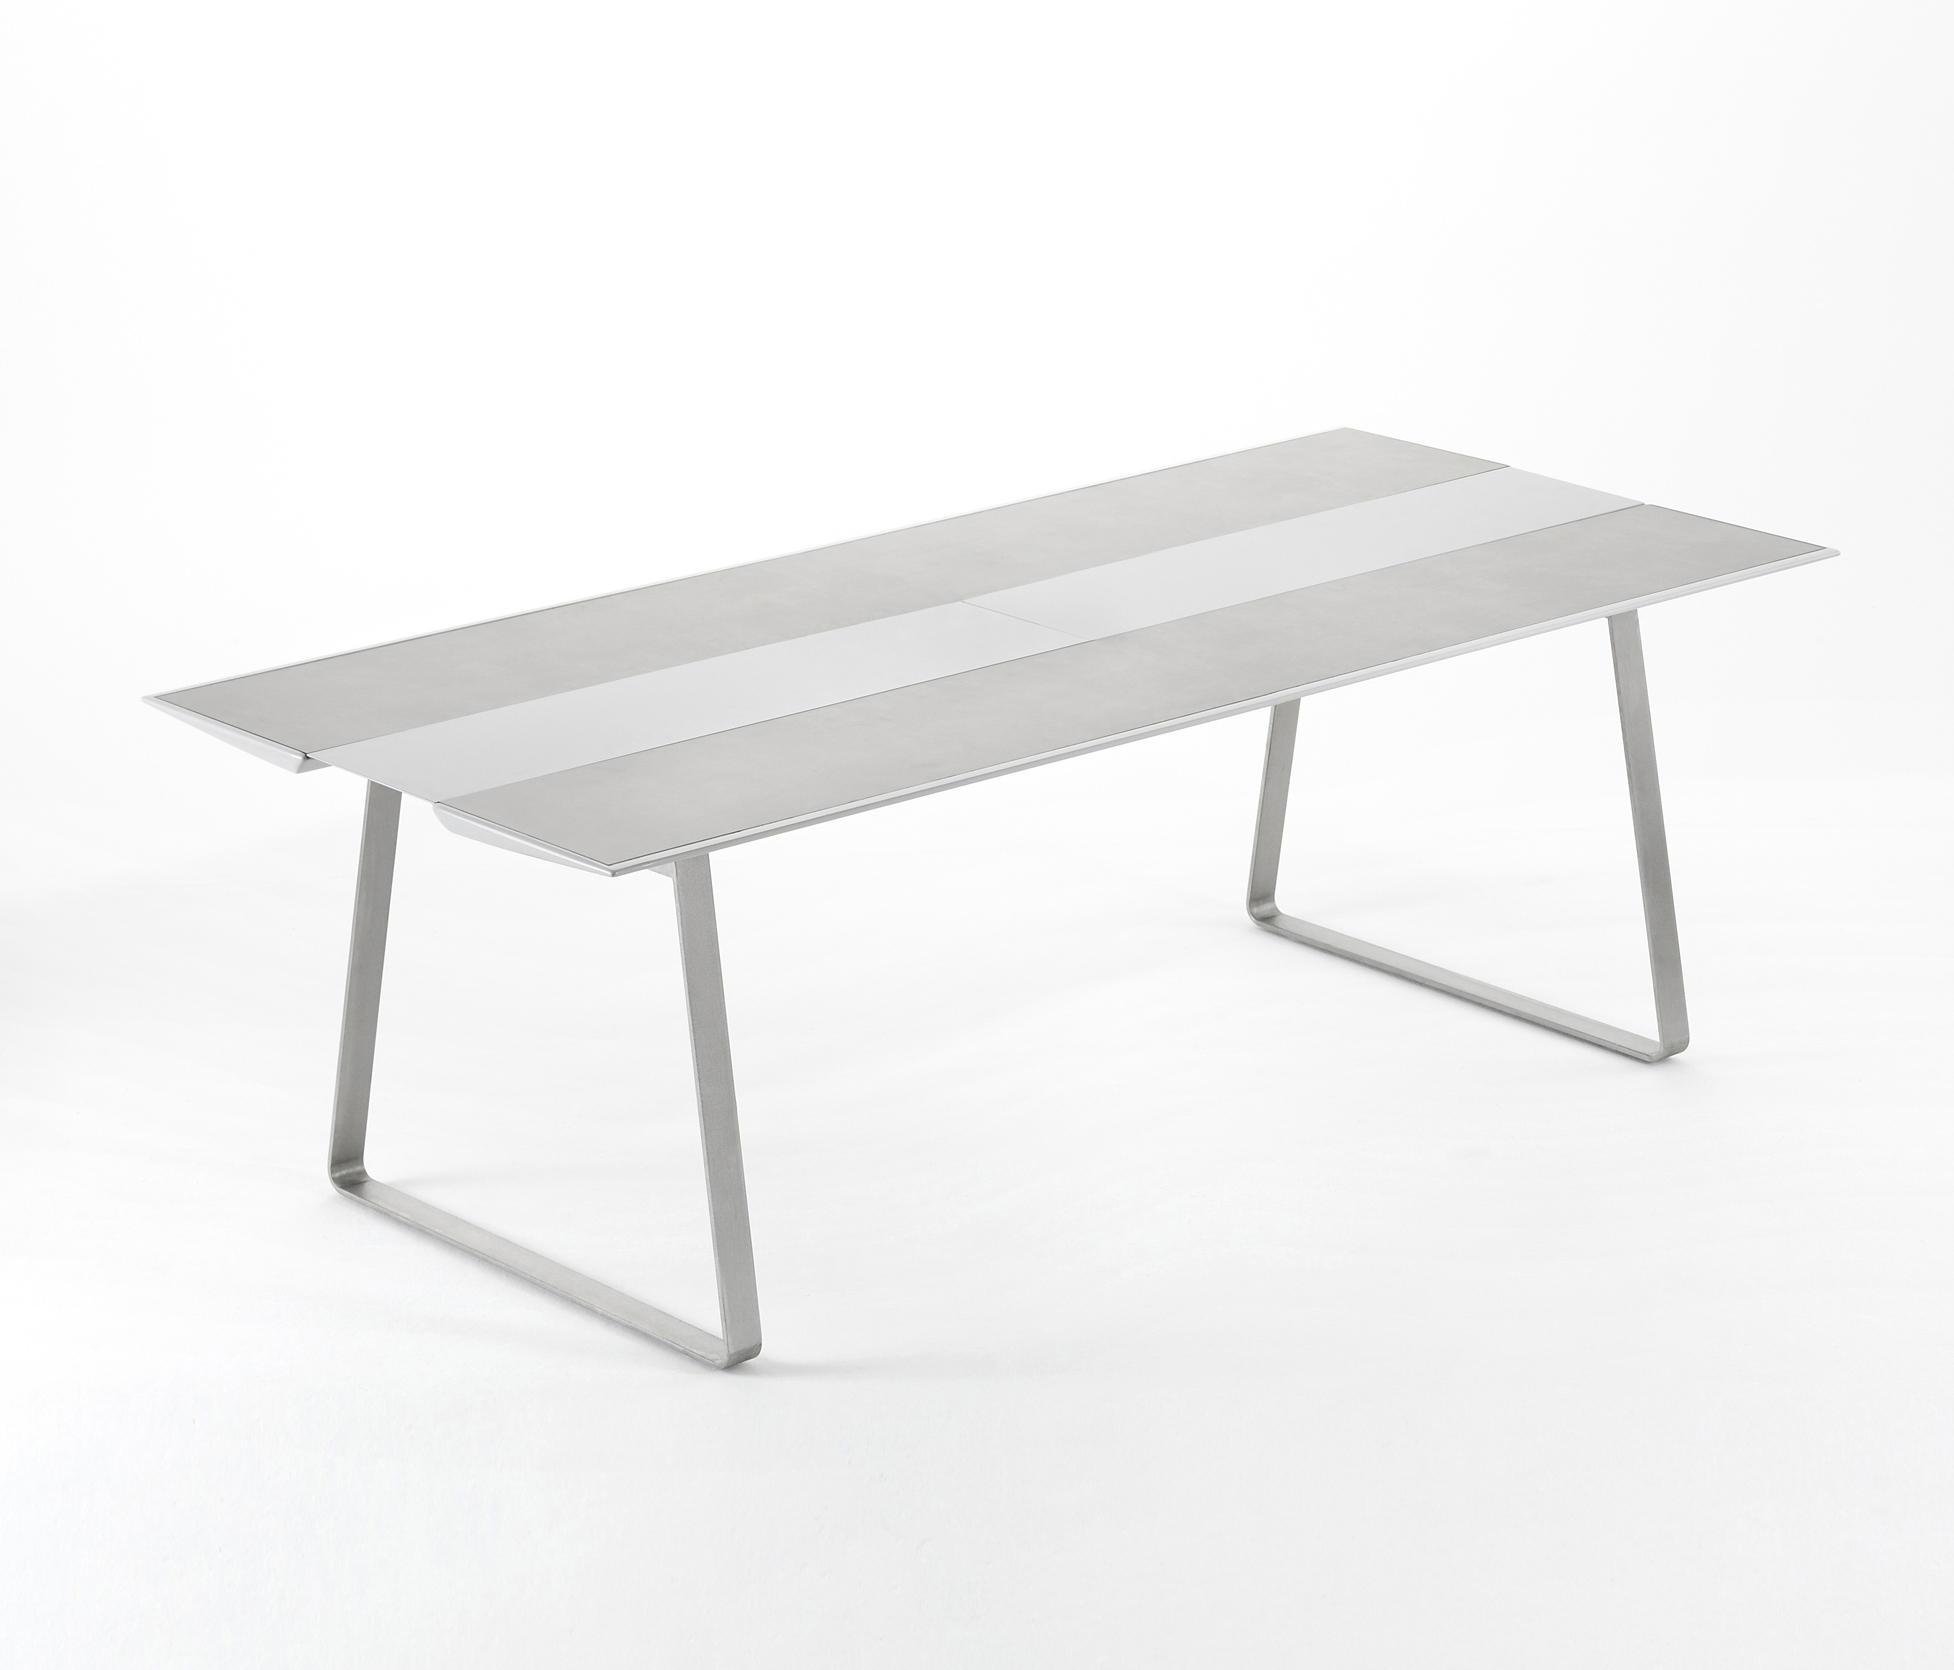 Extrados table 240 tables manger de jardin de ego - Table de jardin ovale extensible fort de france ...